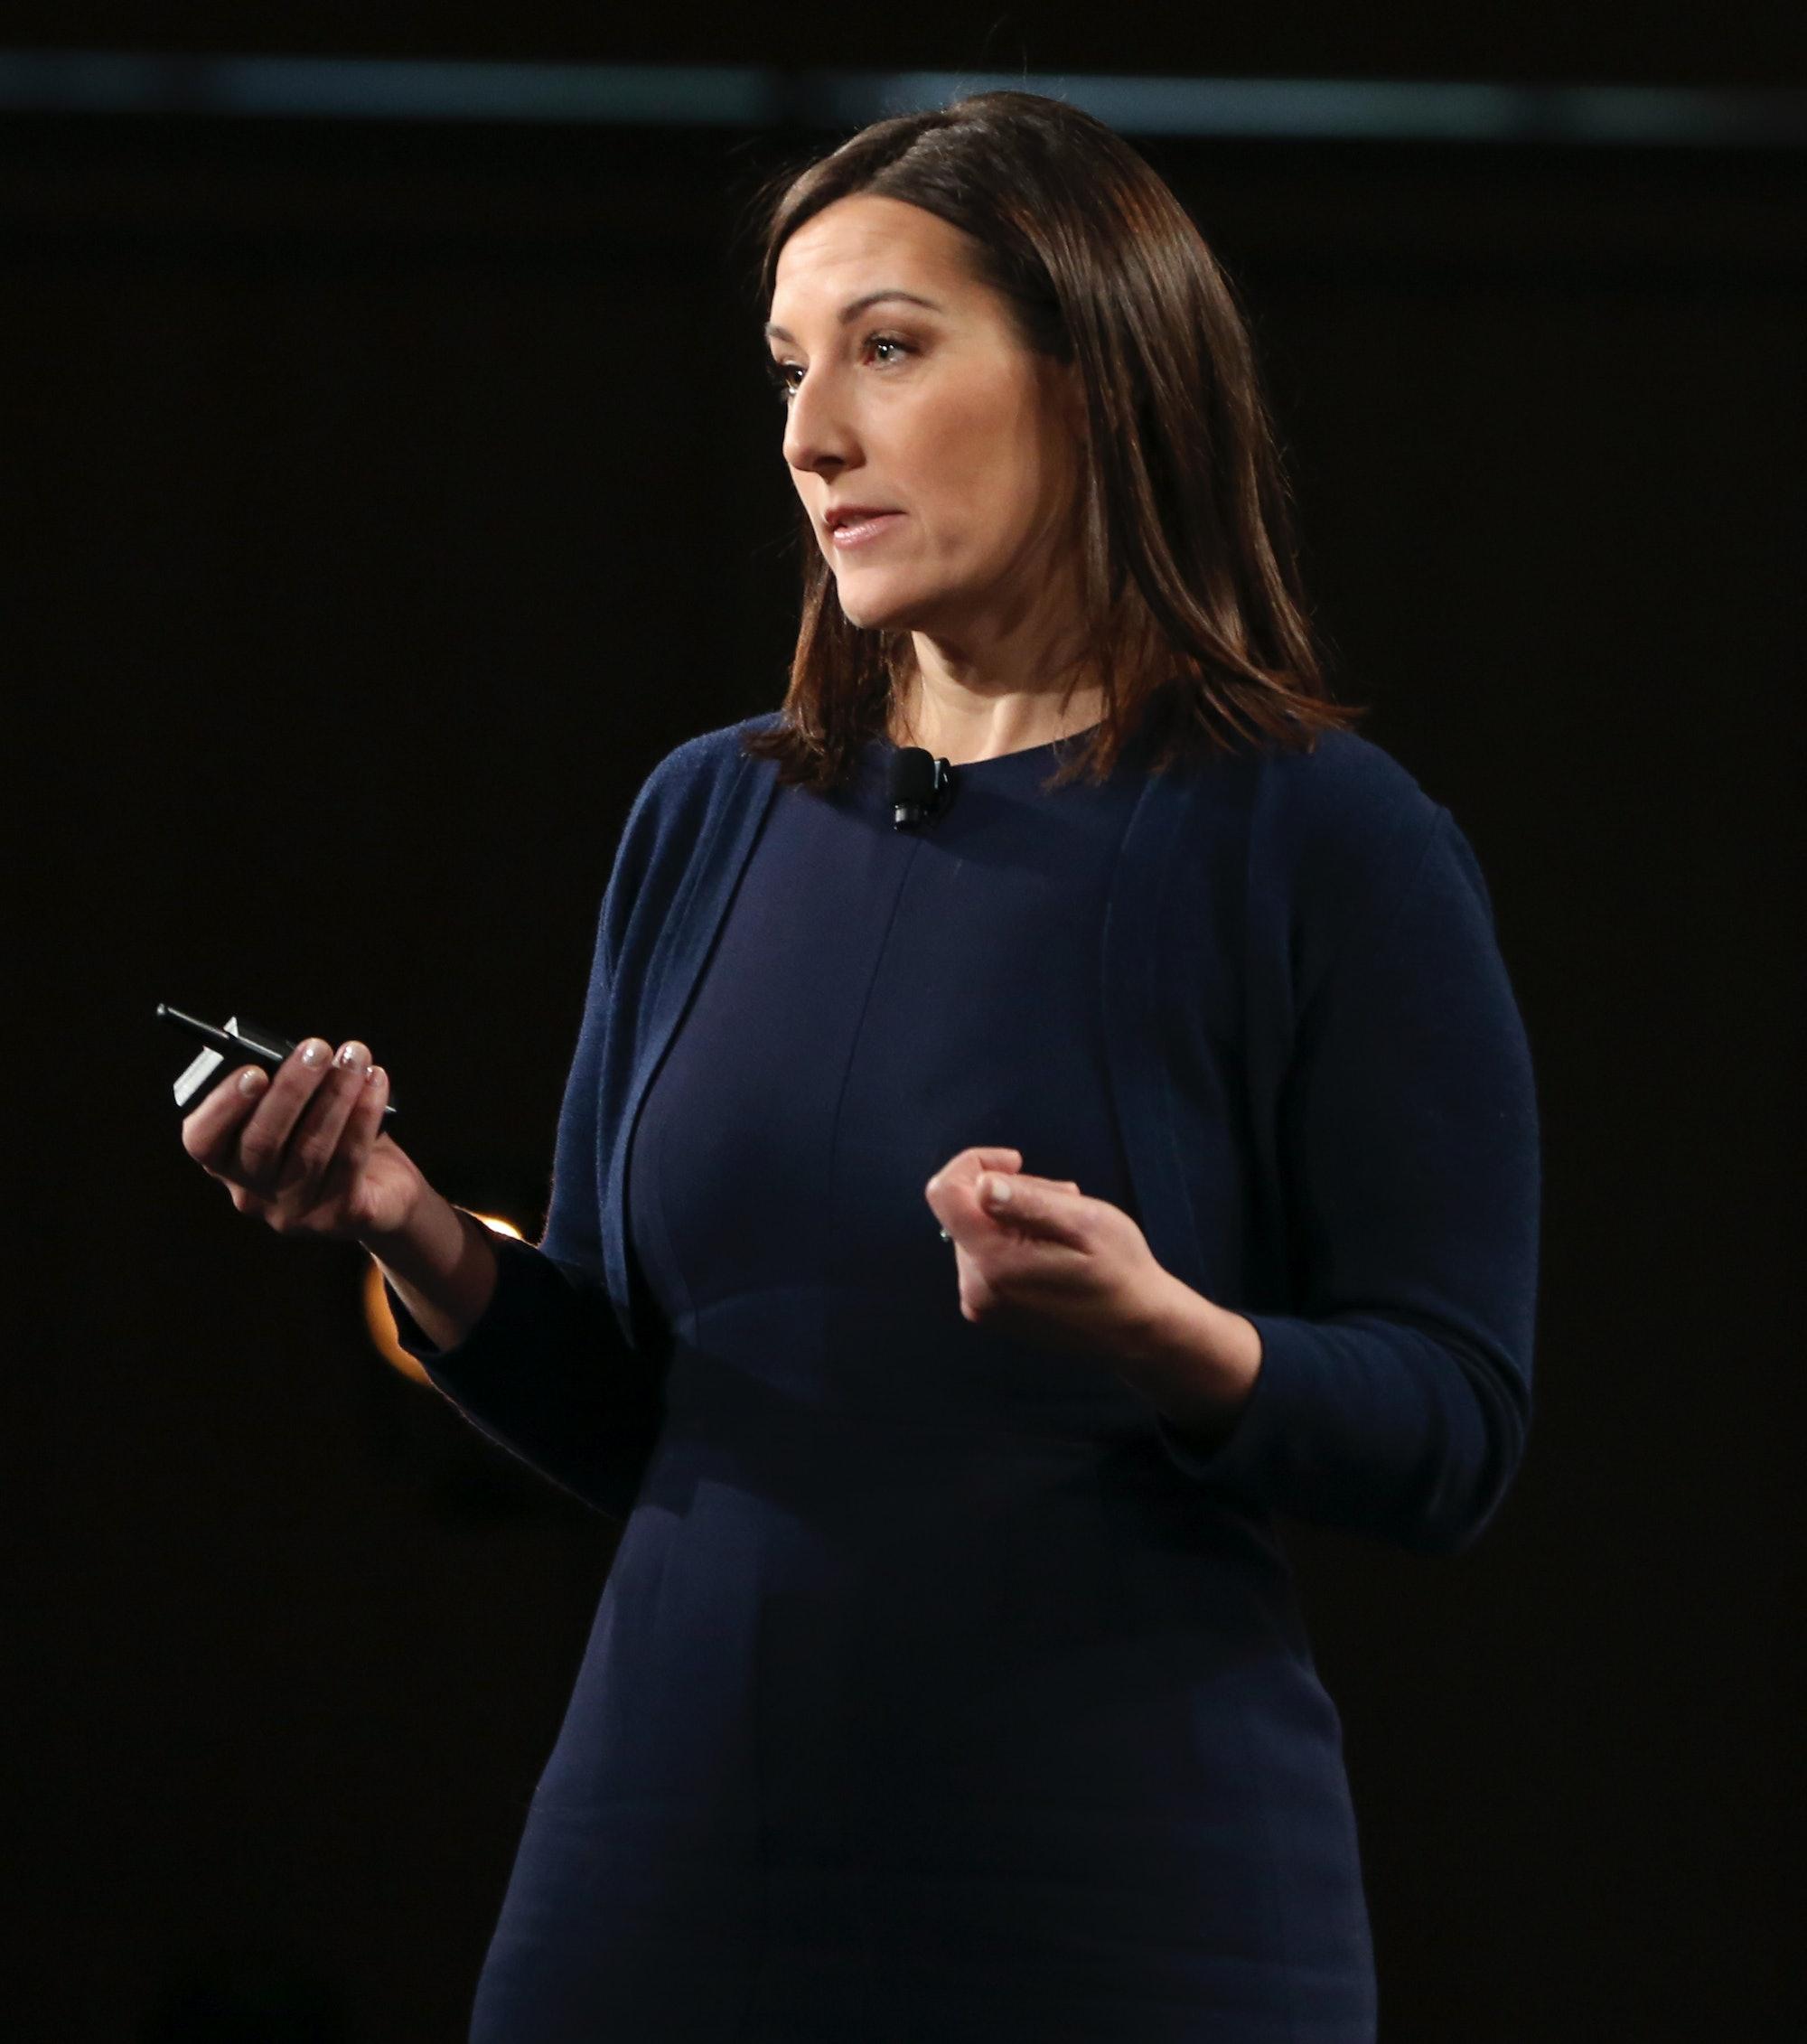 Facebook Recruiting Gender Gap